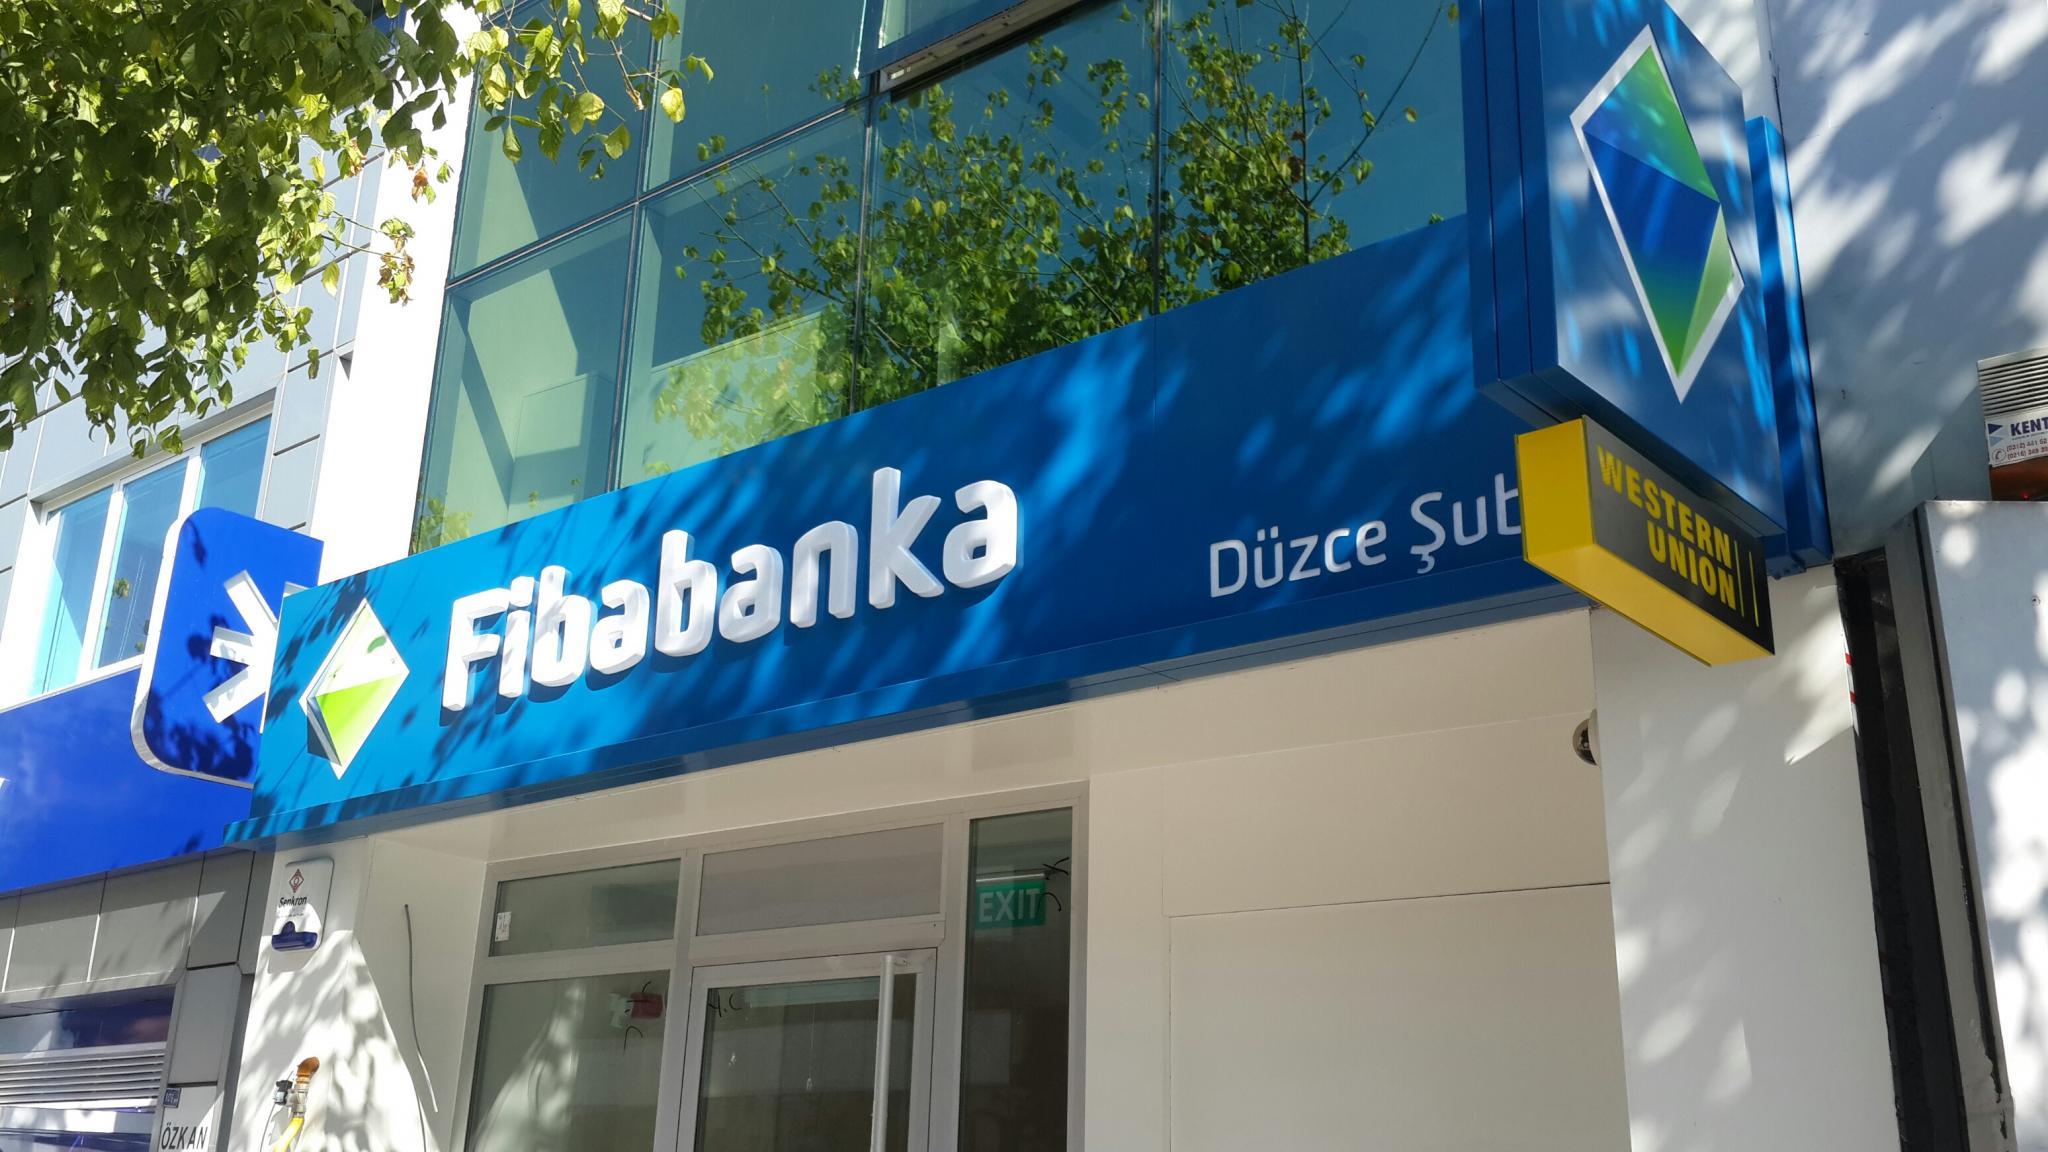 fibabanka-bayrama-ozel-dusuk-faizli-ihtiyac-kredisi